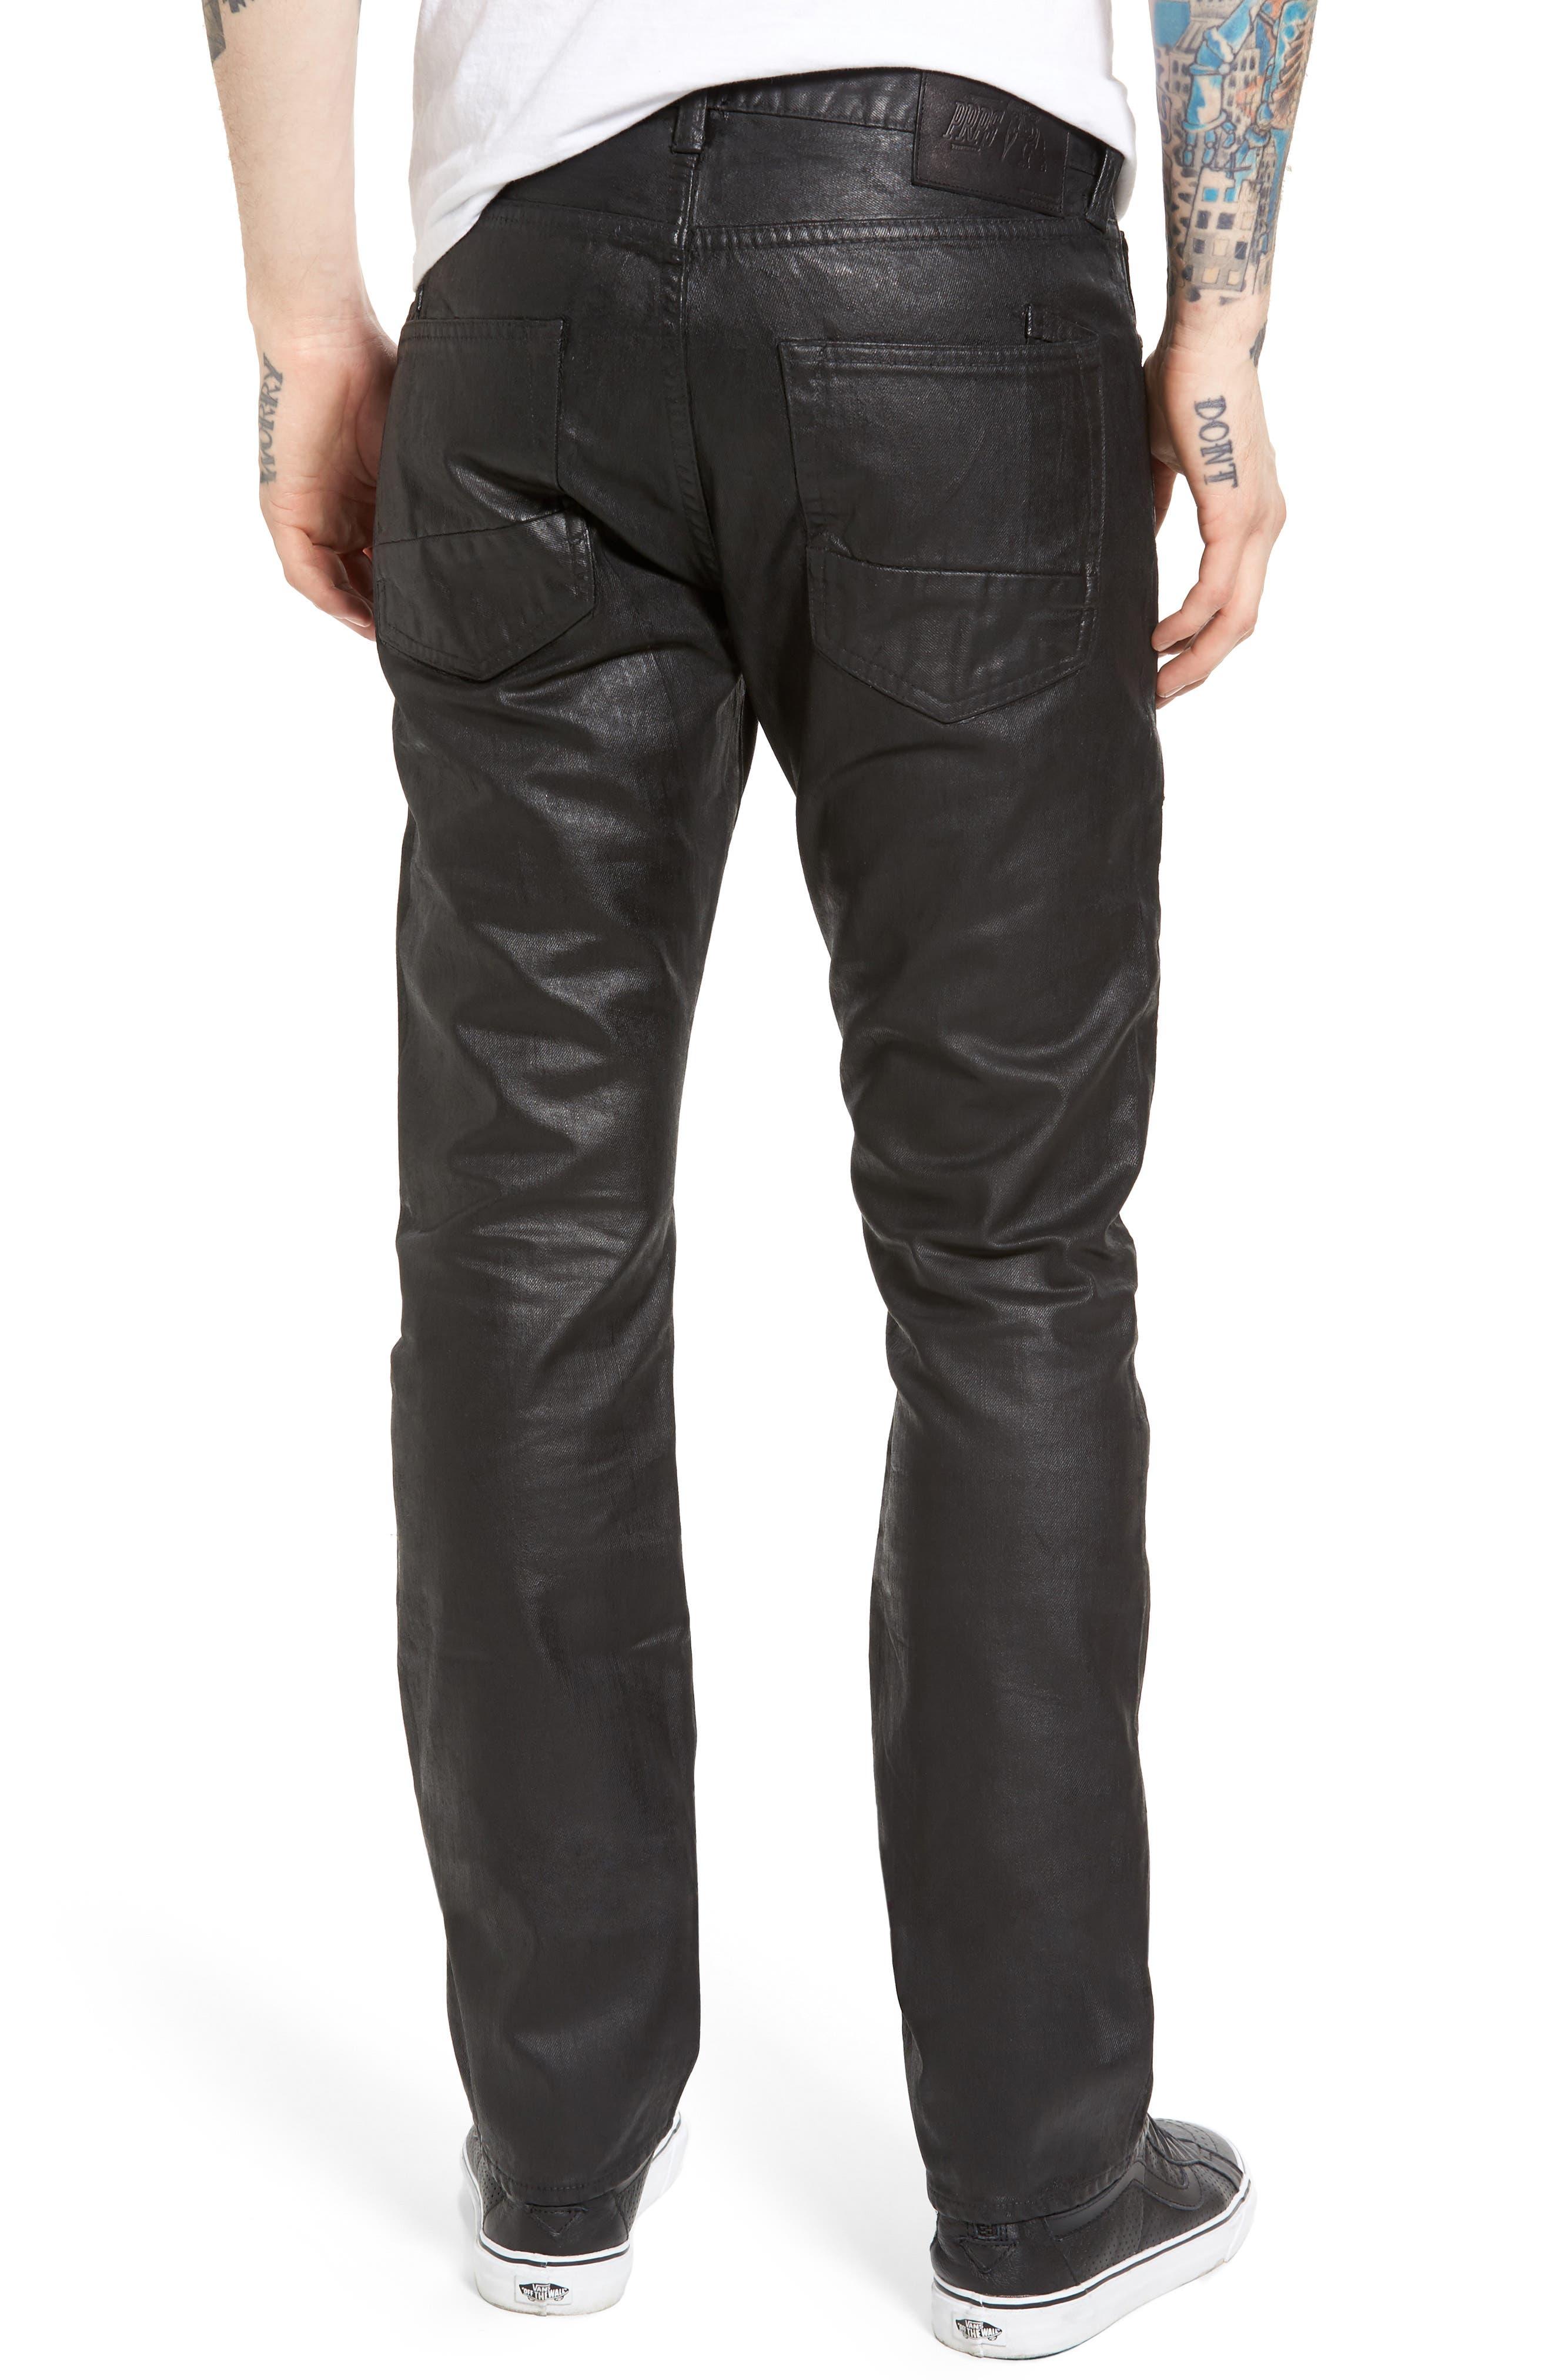 Demon Slim Straight Coated Jeans,                             Alternate thumbnail 2, color,                             BLACK